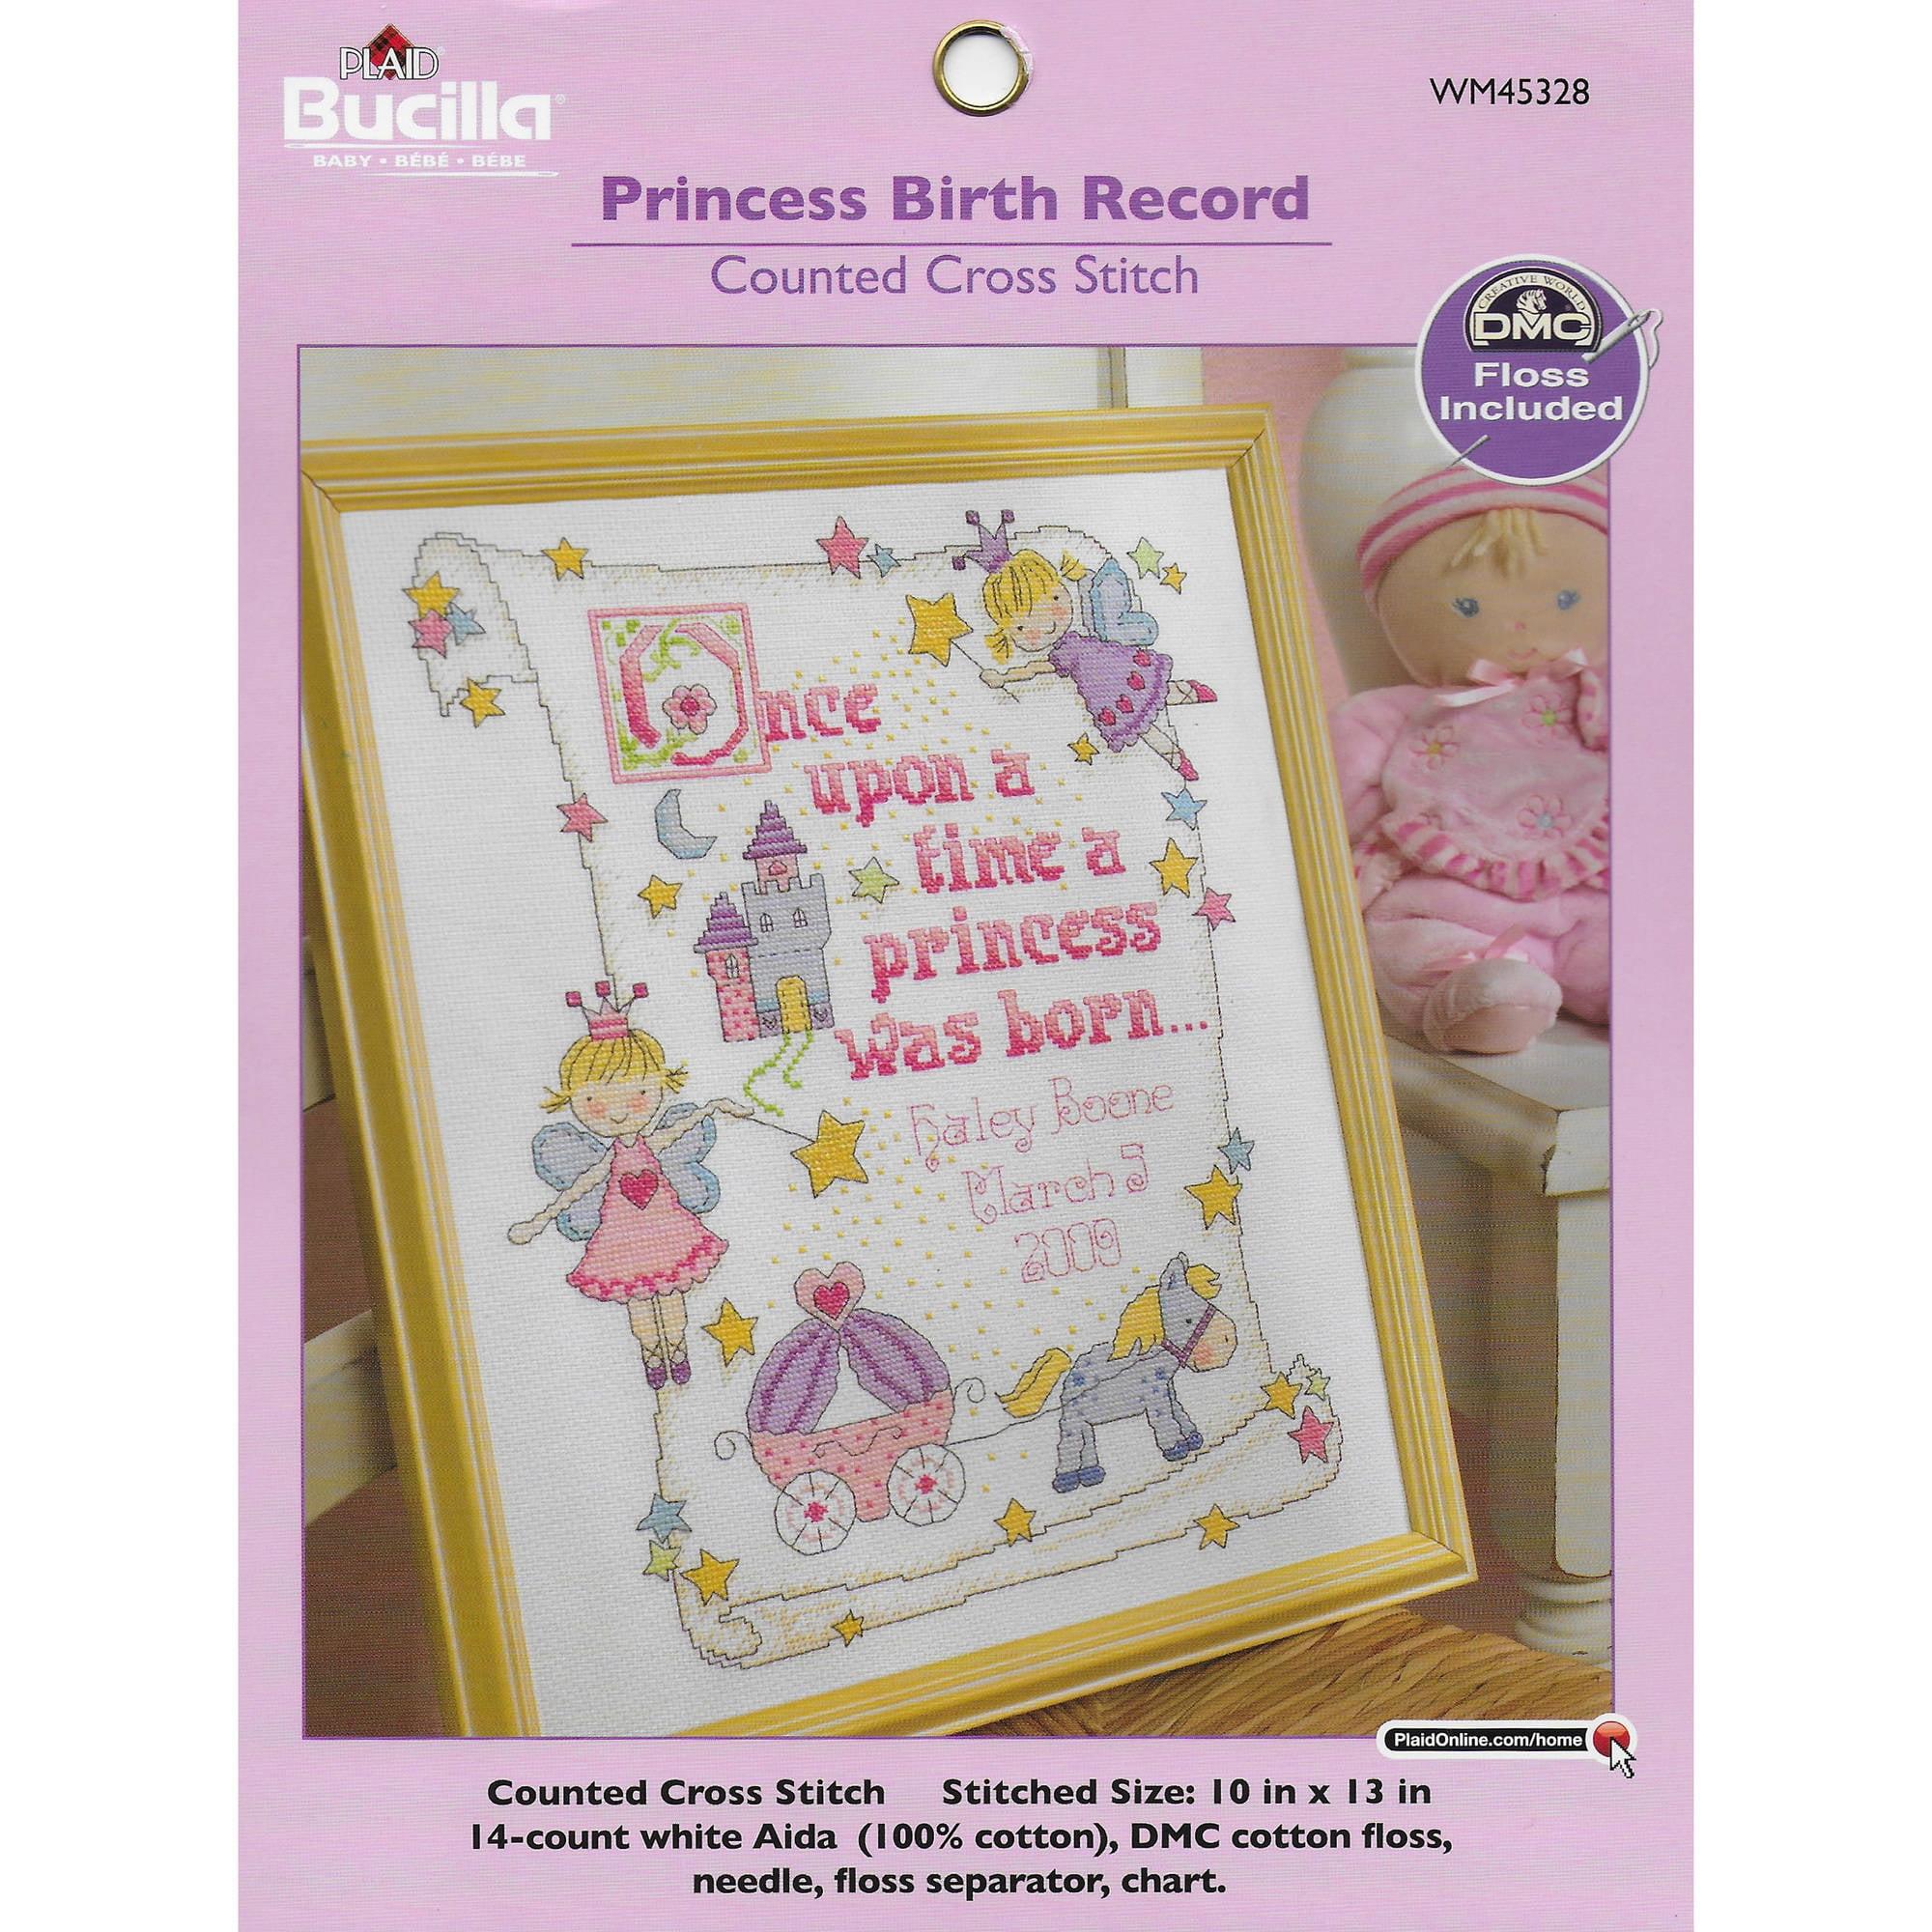 Bucilla Counted Cross Stitch Kit 10x13 Princess Birth Record 14